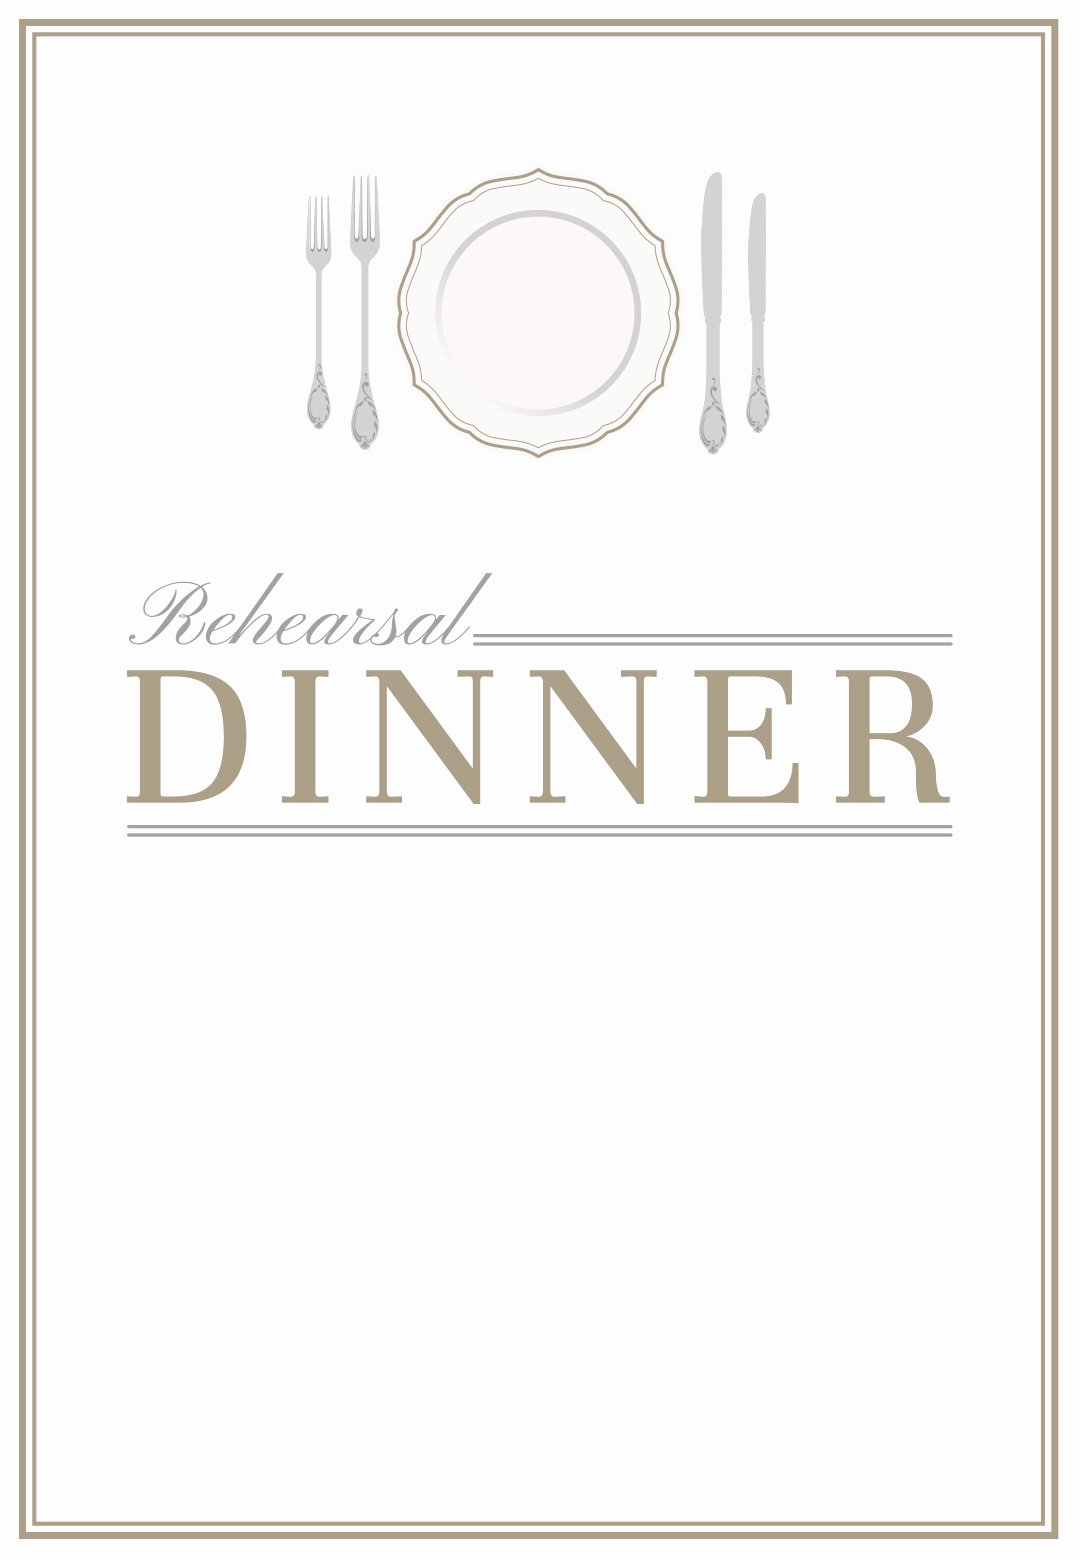 Dinner Invitation Templates Free Printable Templates